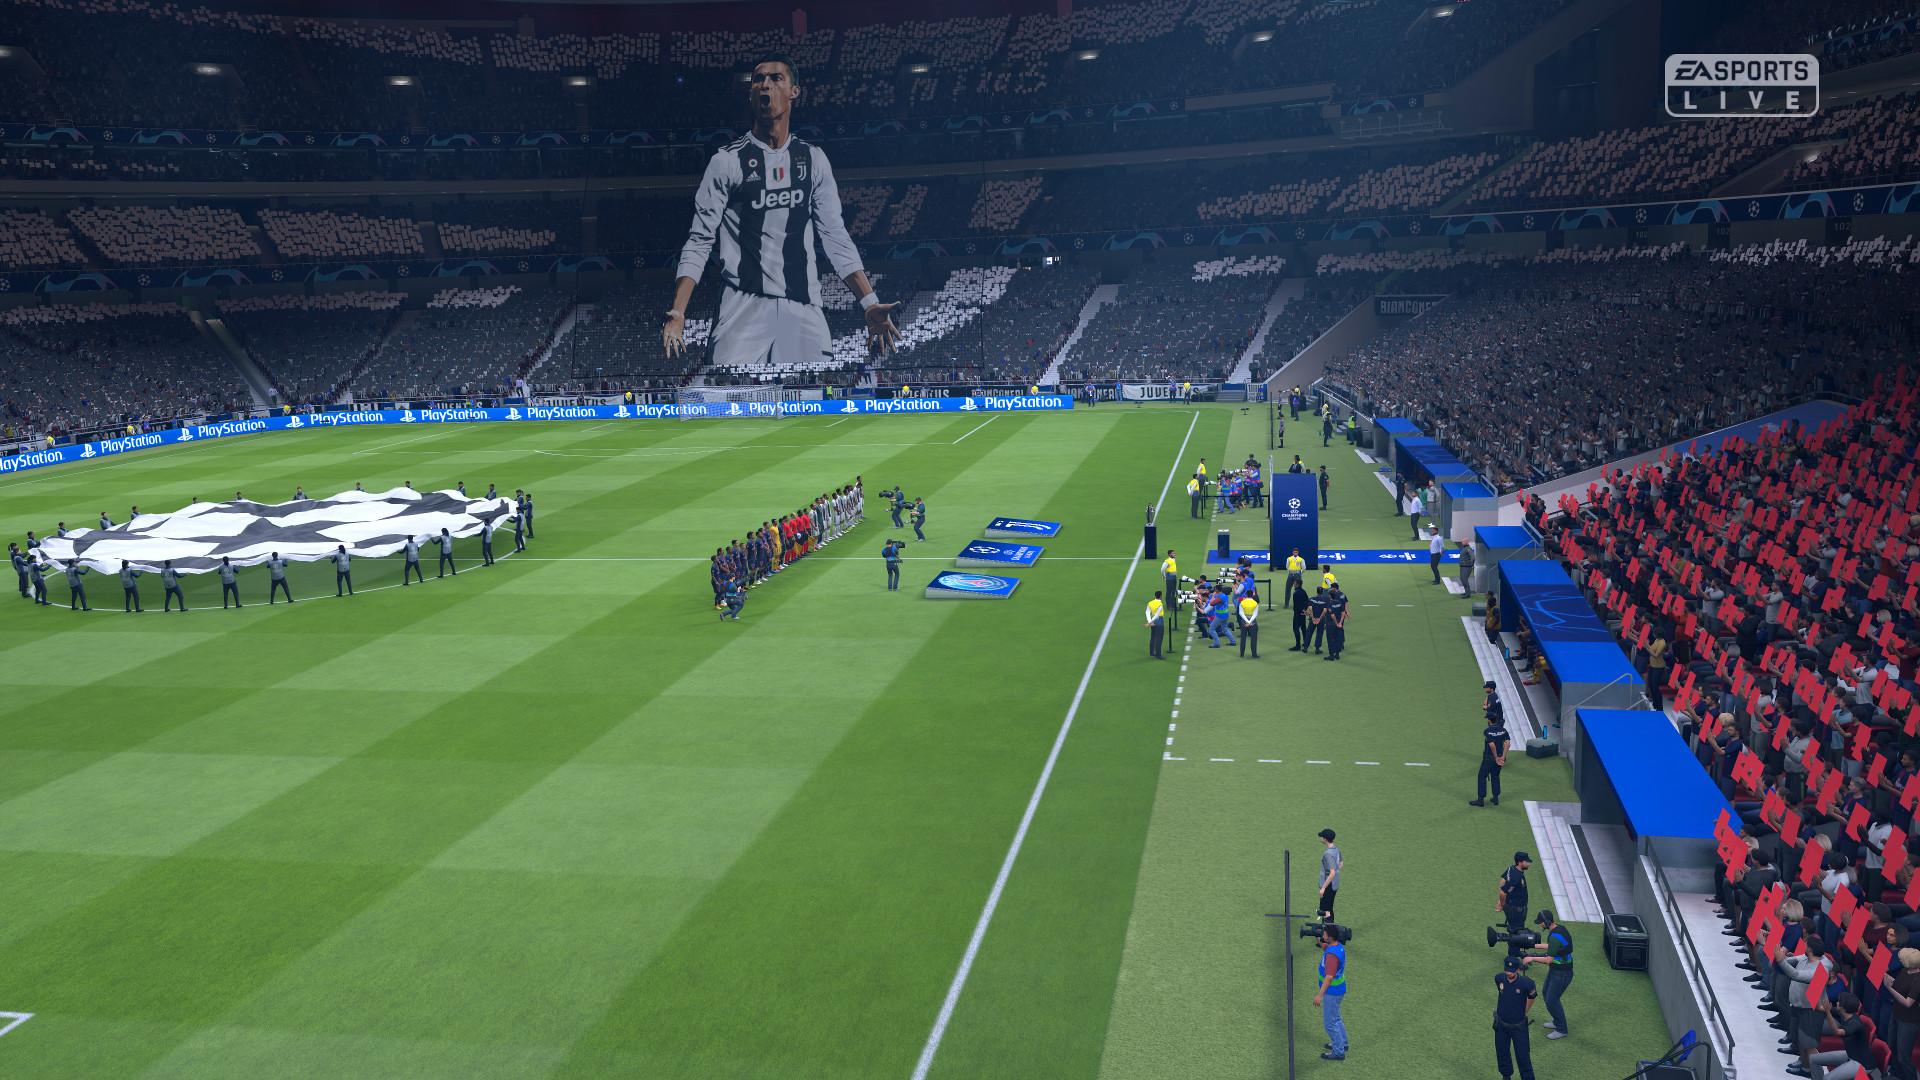 FIFA 19 Champions League Cristiano Ronaldo